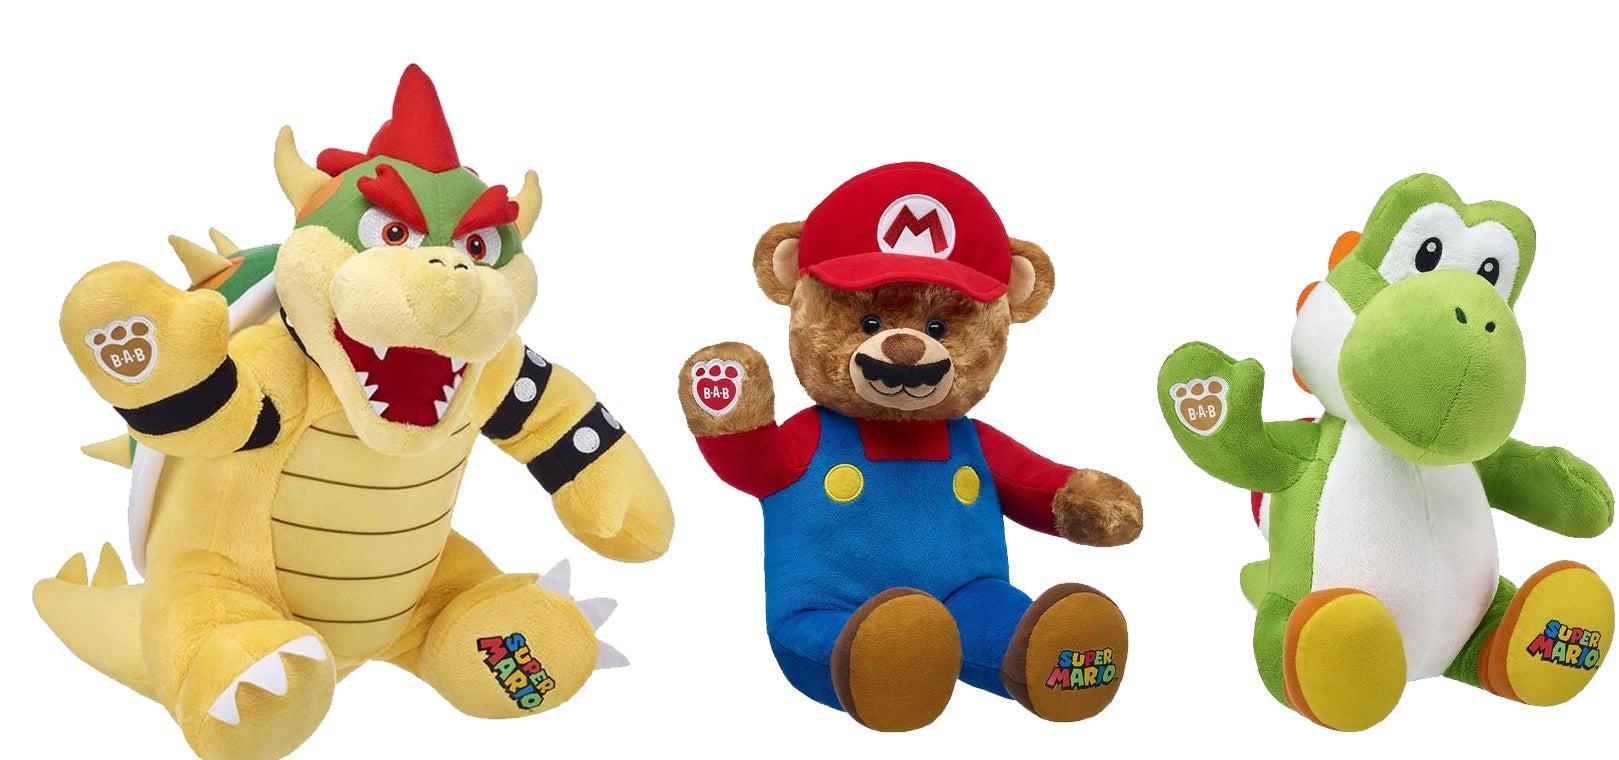 Mario And Bowser Get Along Much Better As Build-A-Bears  Kotaku Australia-7921